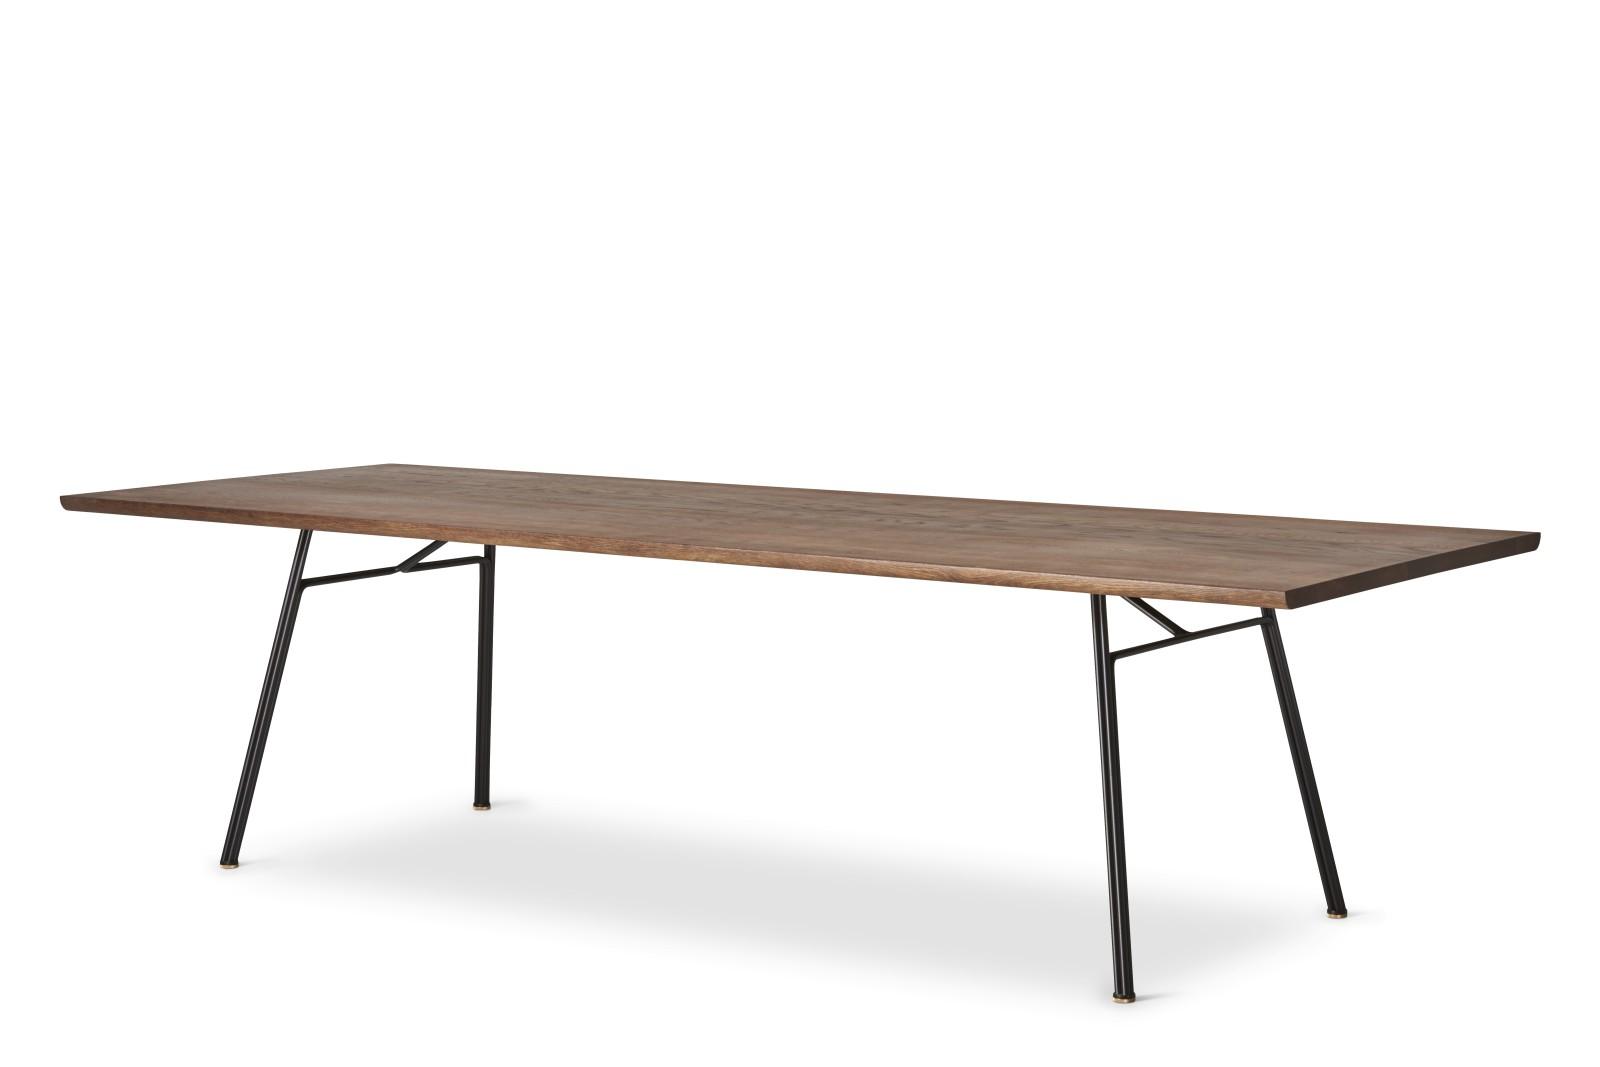 Corduroy Dining Table Rectangular Smoke Oak Oil Treatment, 300cm, 90cm